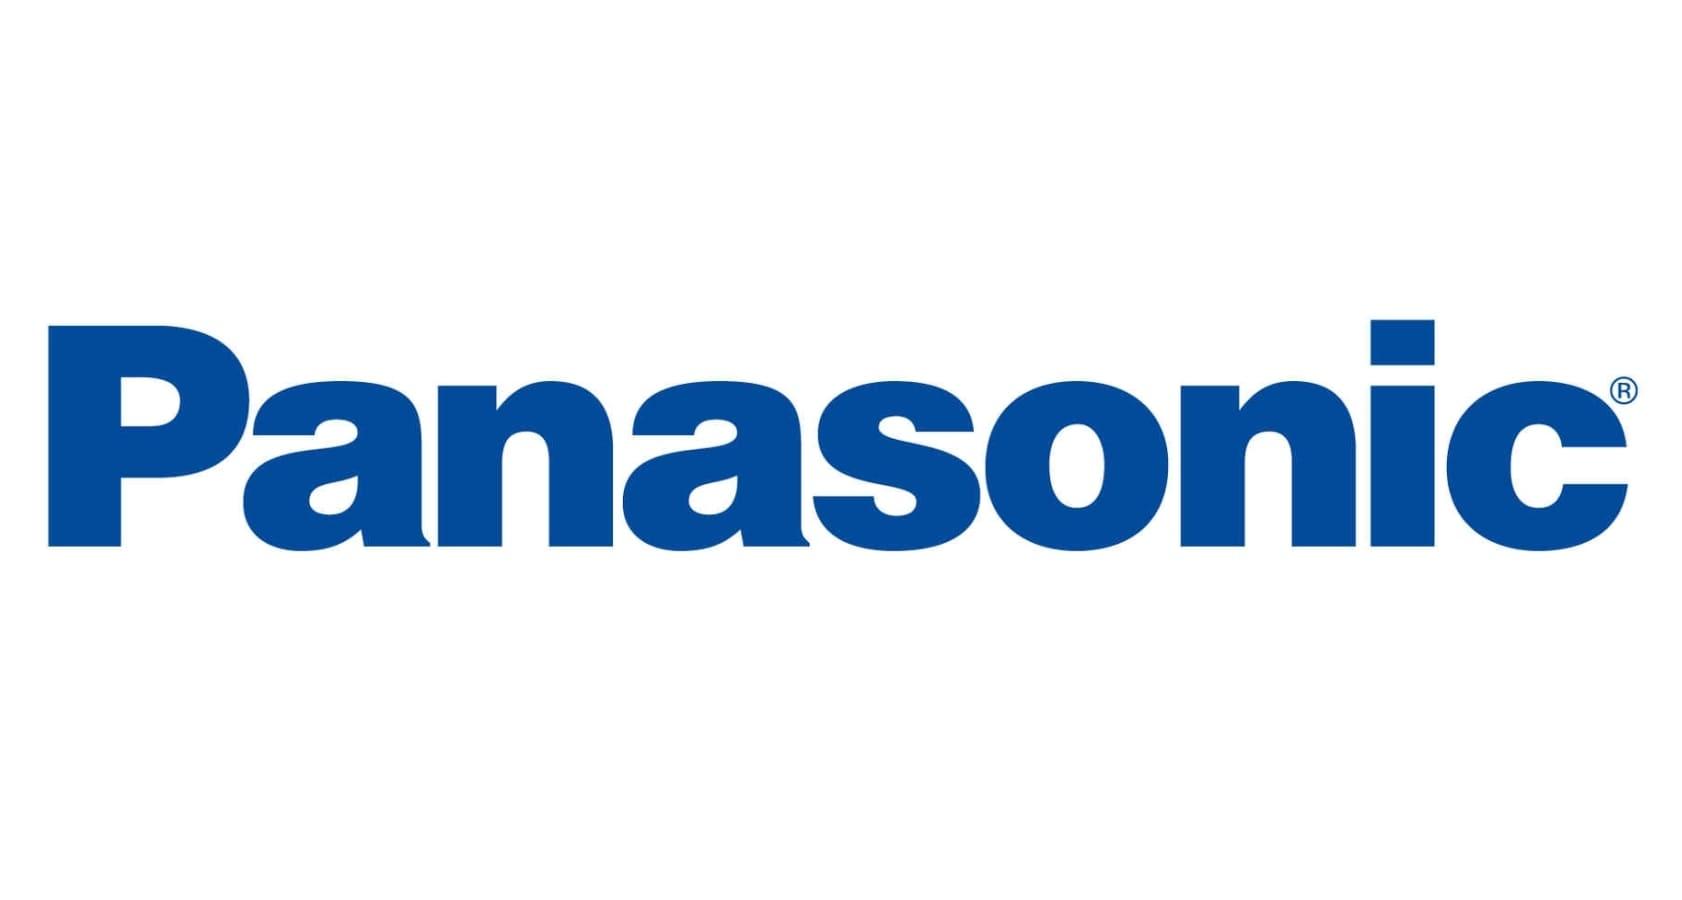 brand logo of Panasonic -SWOT Analysis of Panasonic   IIDE